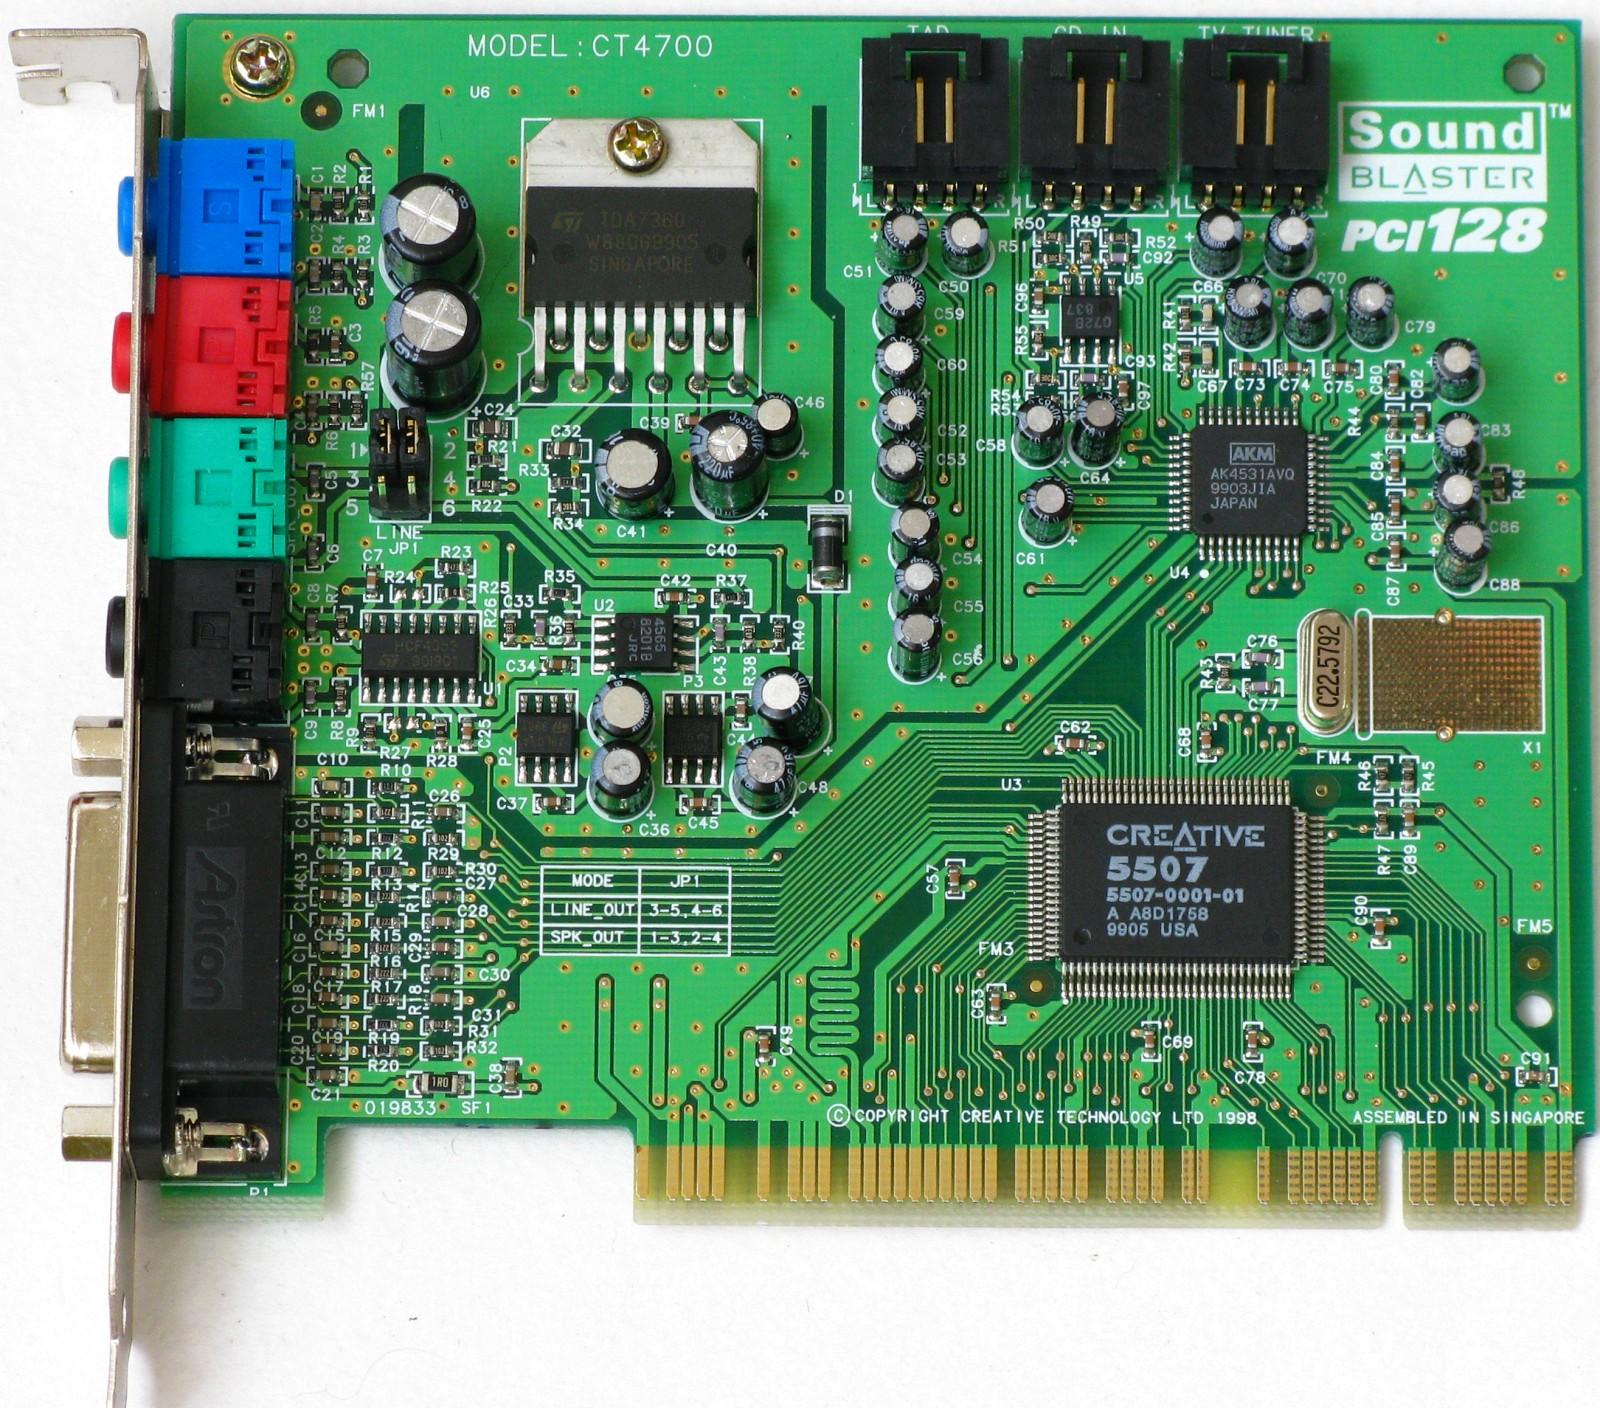 CREATIVE LABS PCI 128 CT4700 WINDOWS 8.1 DRIVER DOWNLOAD